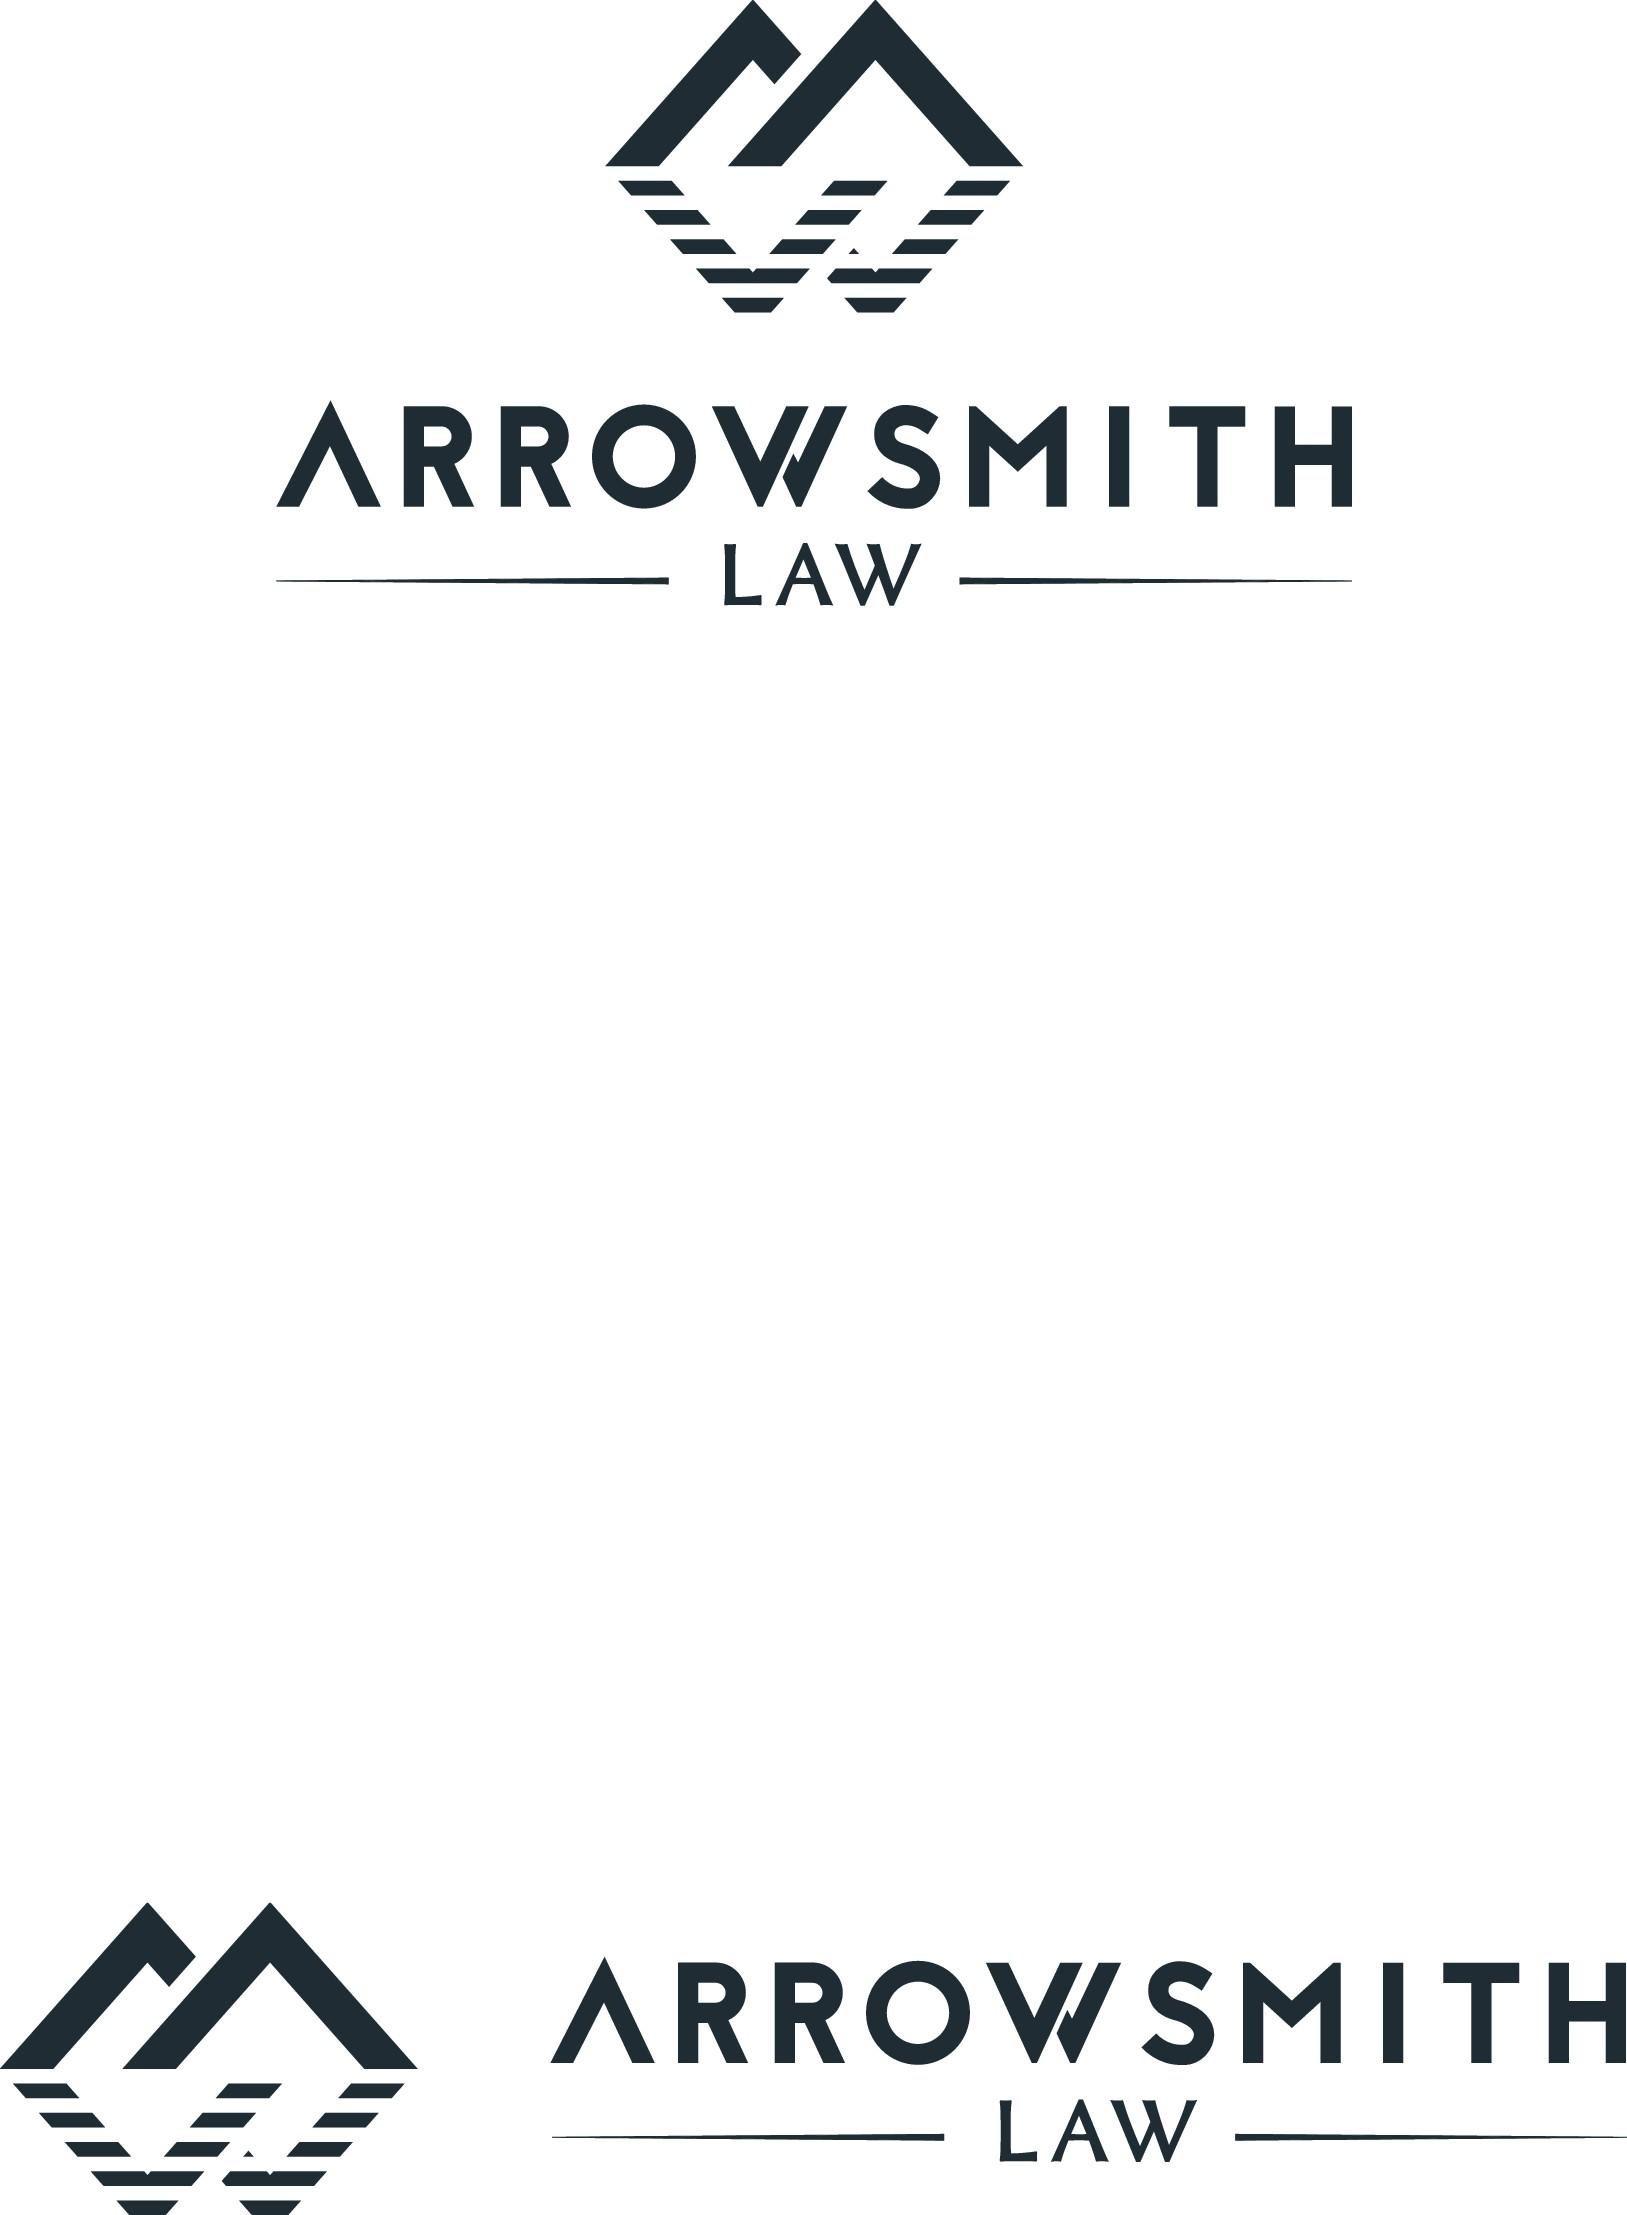 New law firm seeks logo design